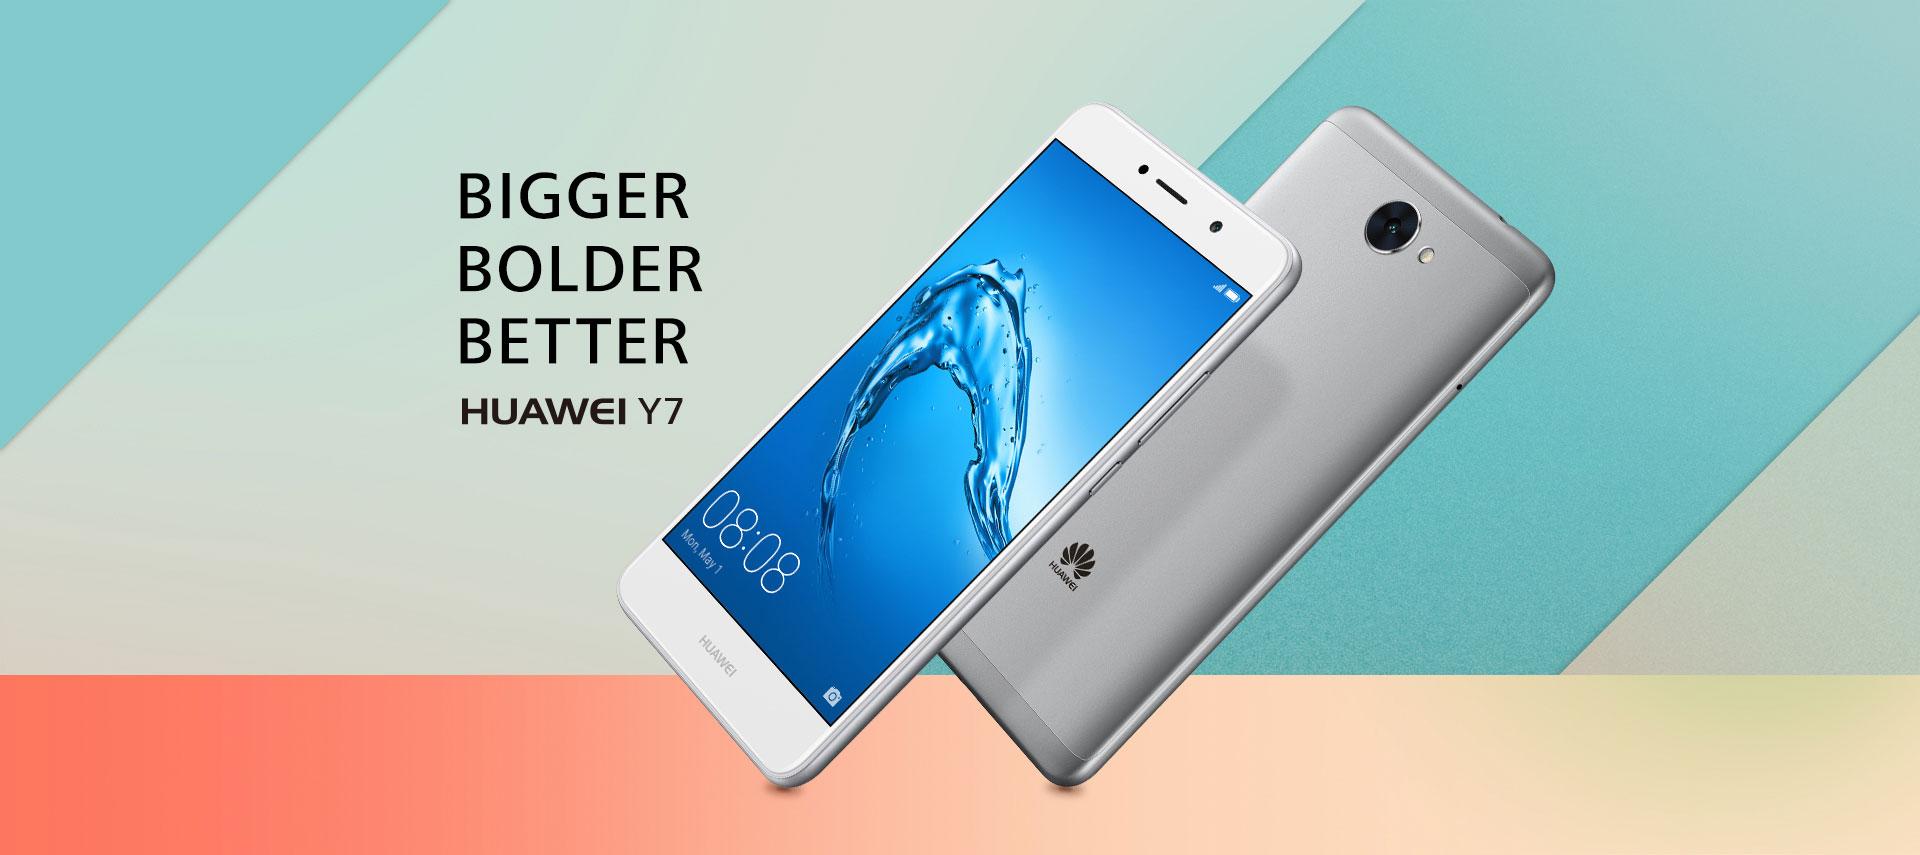 HUAWEI Y7 Smartphone | Mobile Phones | HUAWEI Sri Lanka